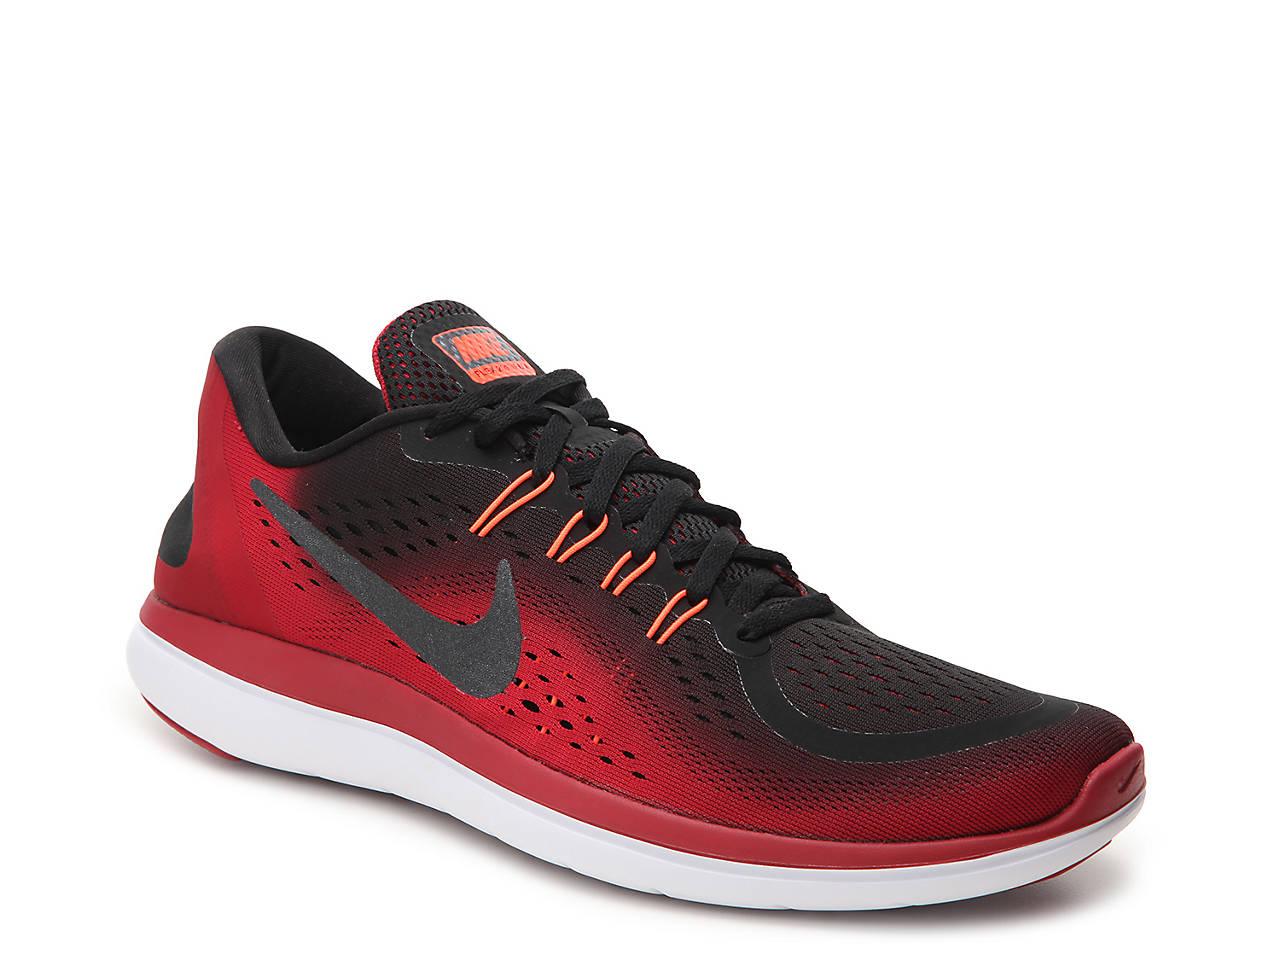 0b371ffa31a2 ... shop flex 2017 rn lightweight running shoe mens fc887 96a7c